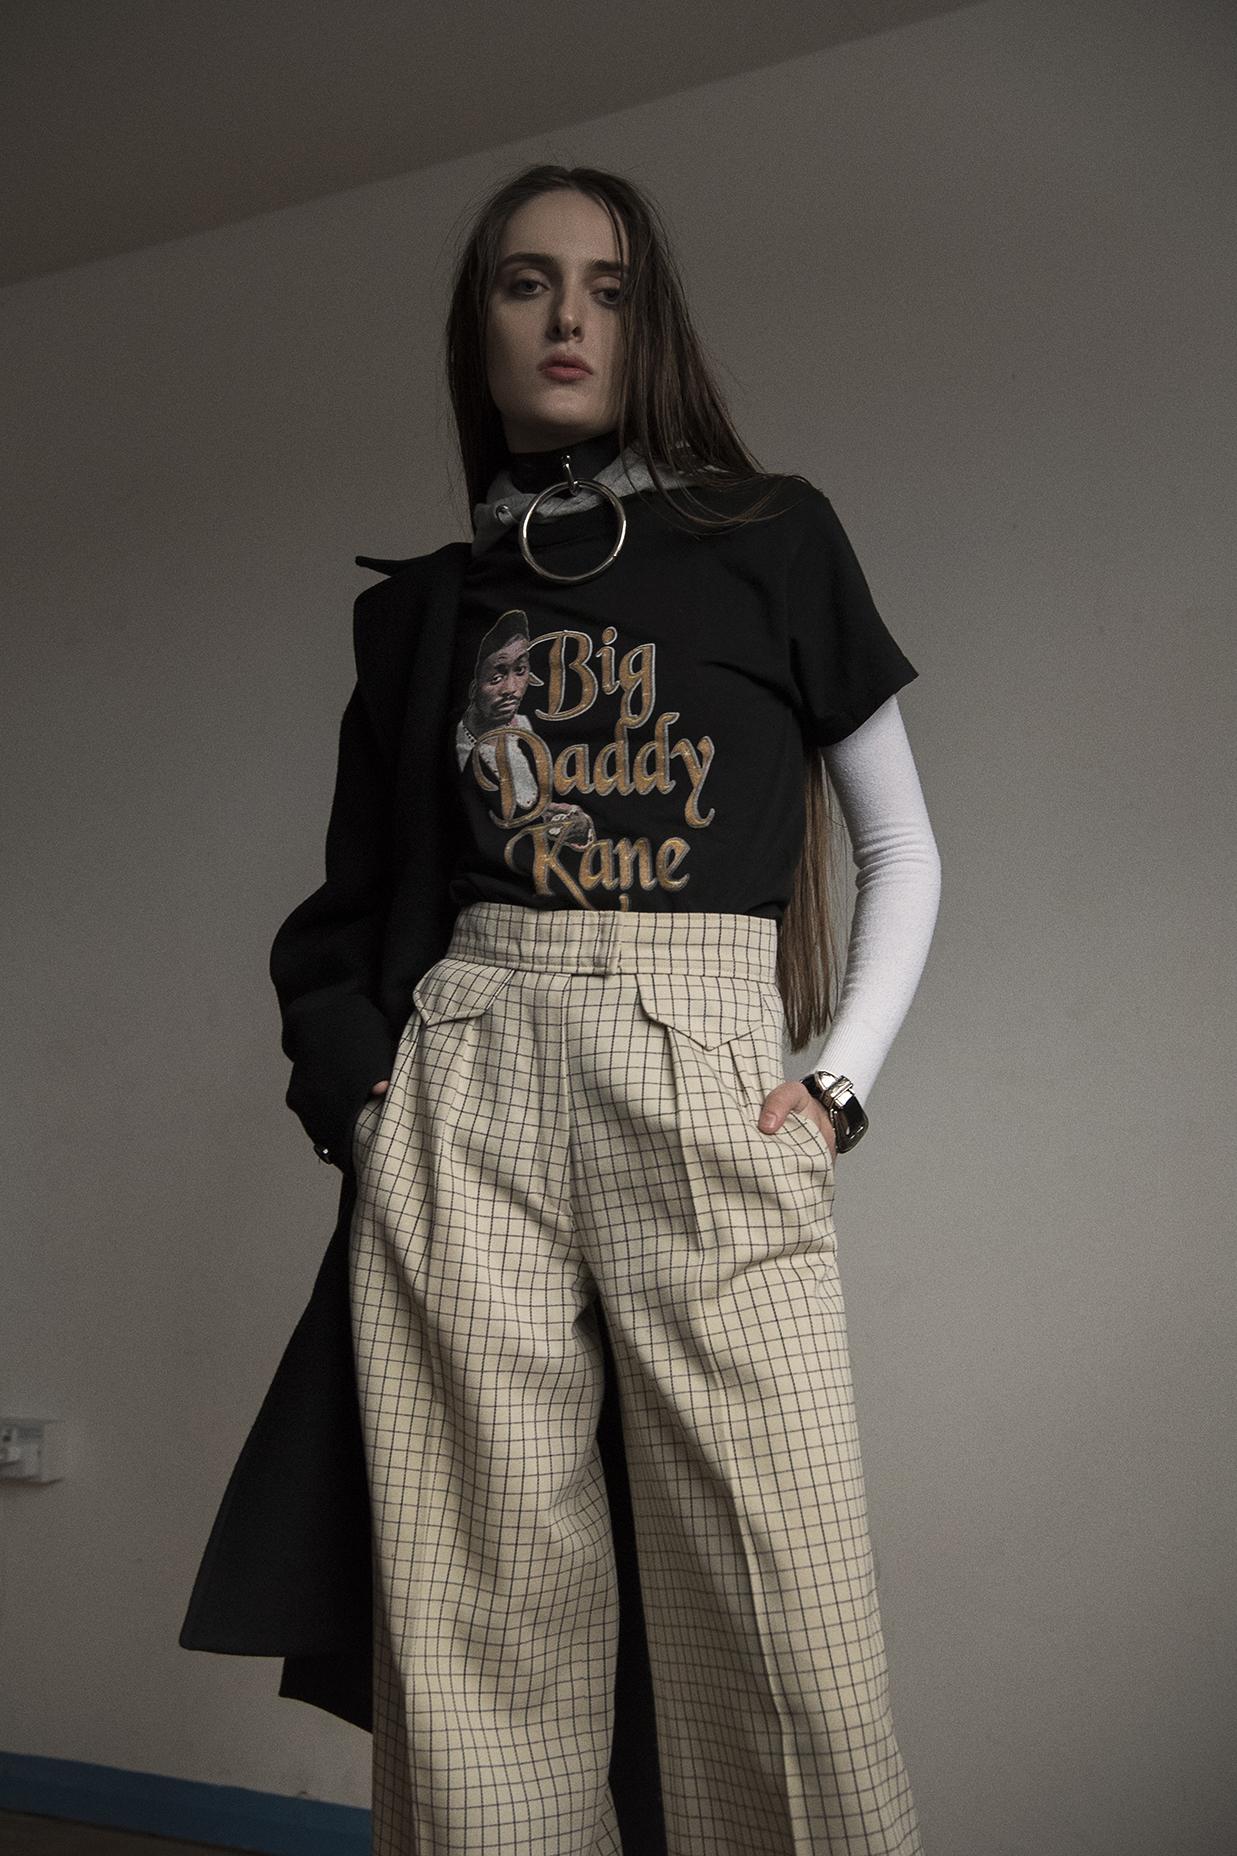 ring choker  hanger  t-shirt  model's own  trousers  chloe  coat  liful